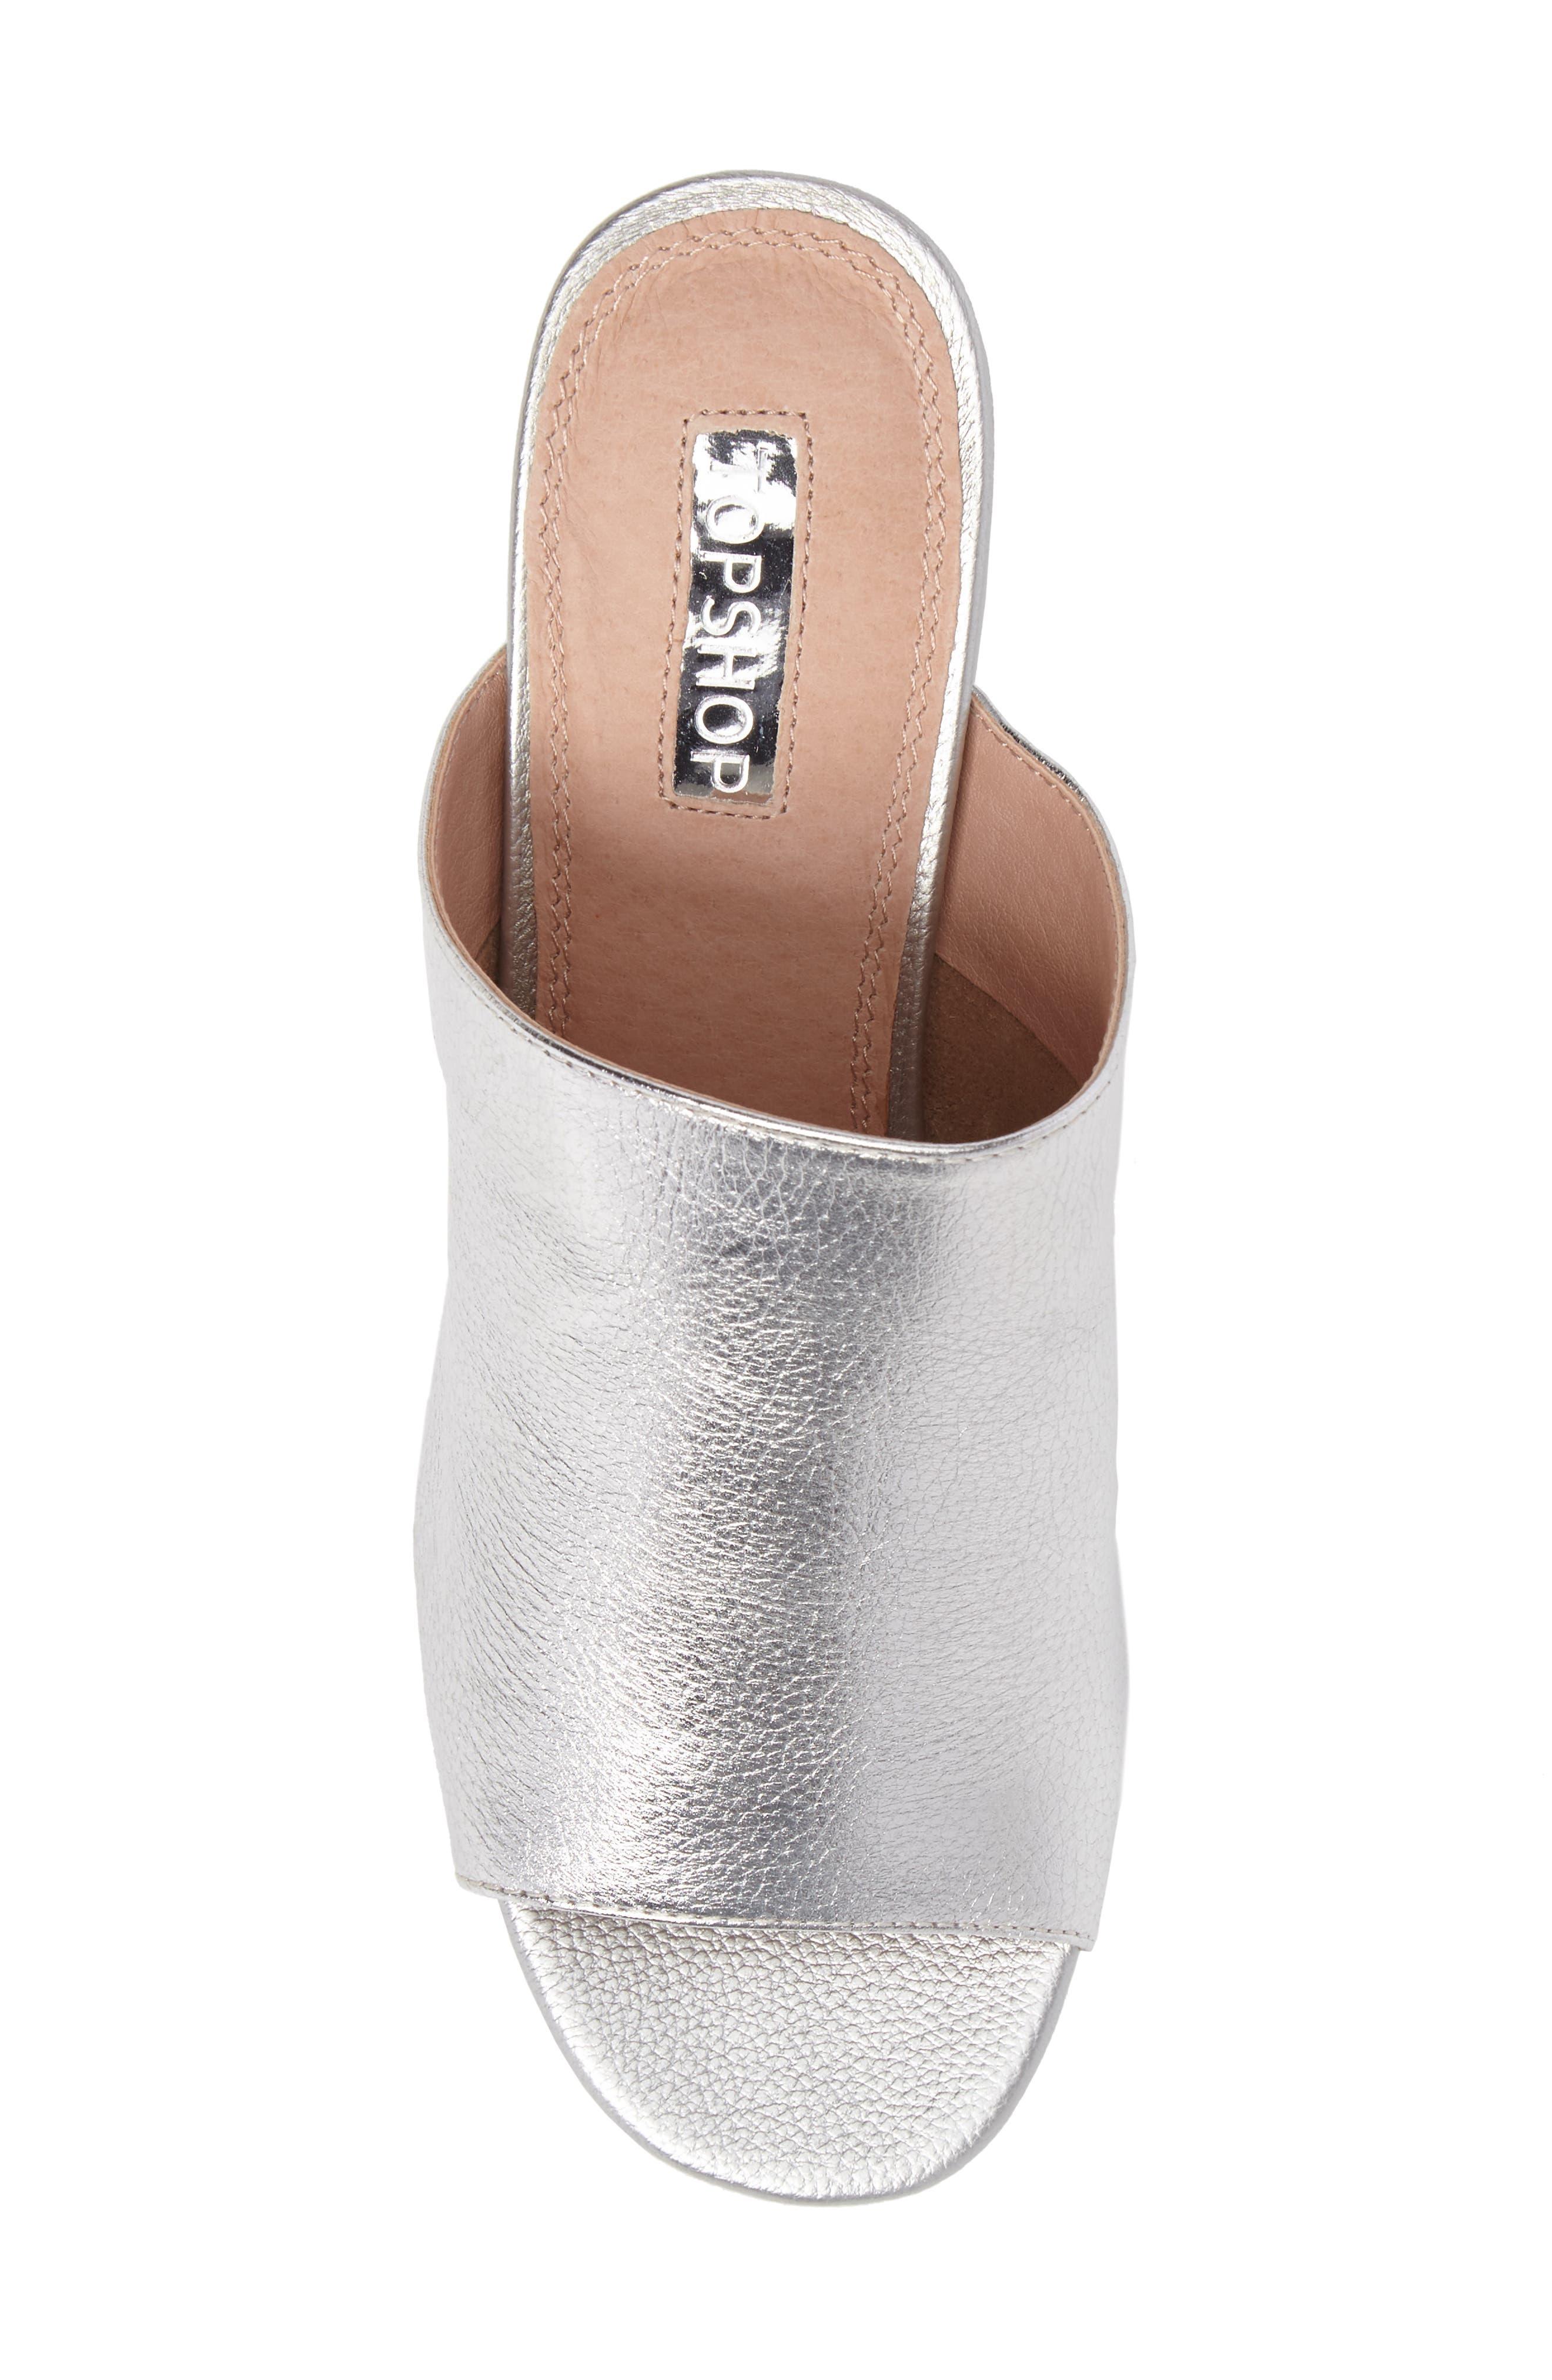 Notorious Metallic Slide Sandal,                             Alternate thumbnail 5, color,                             040